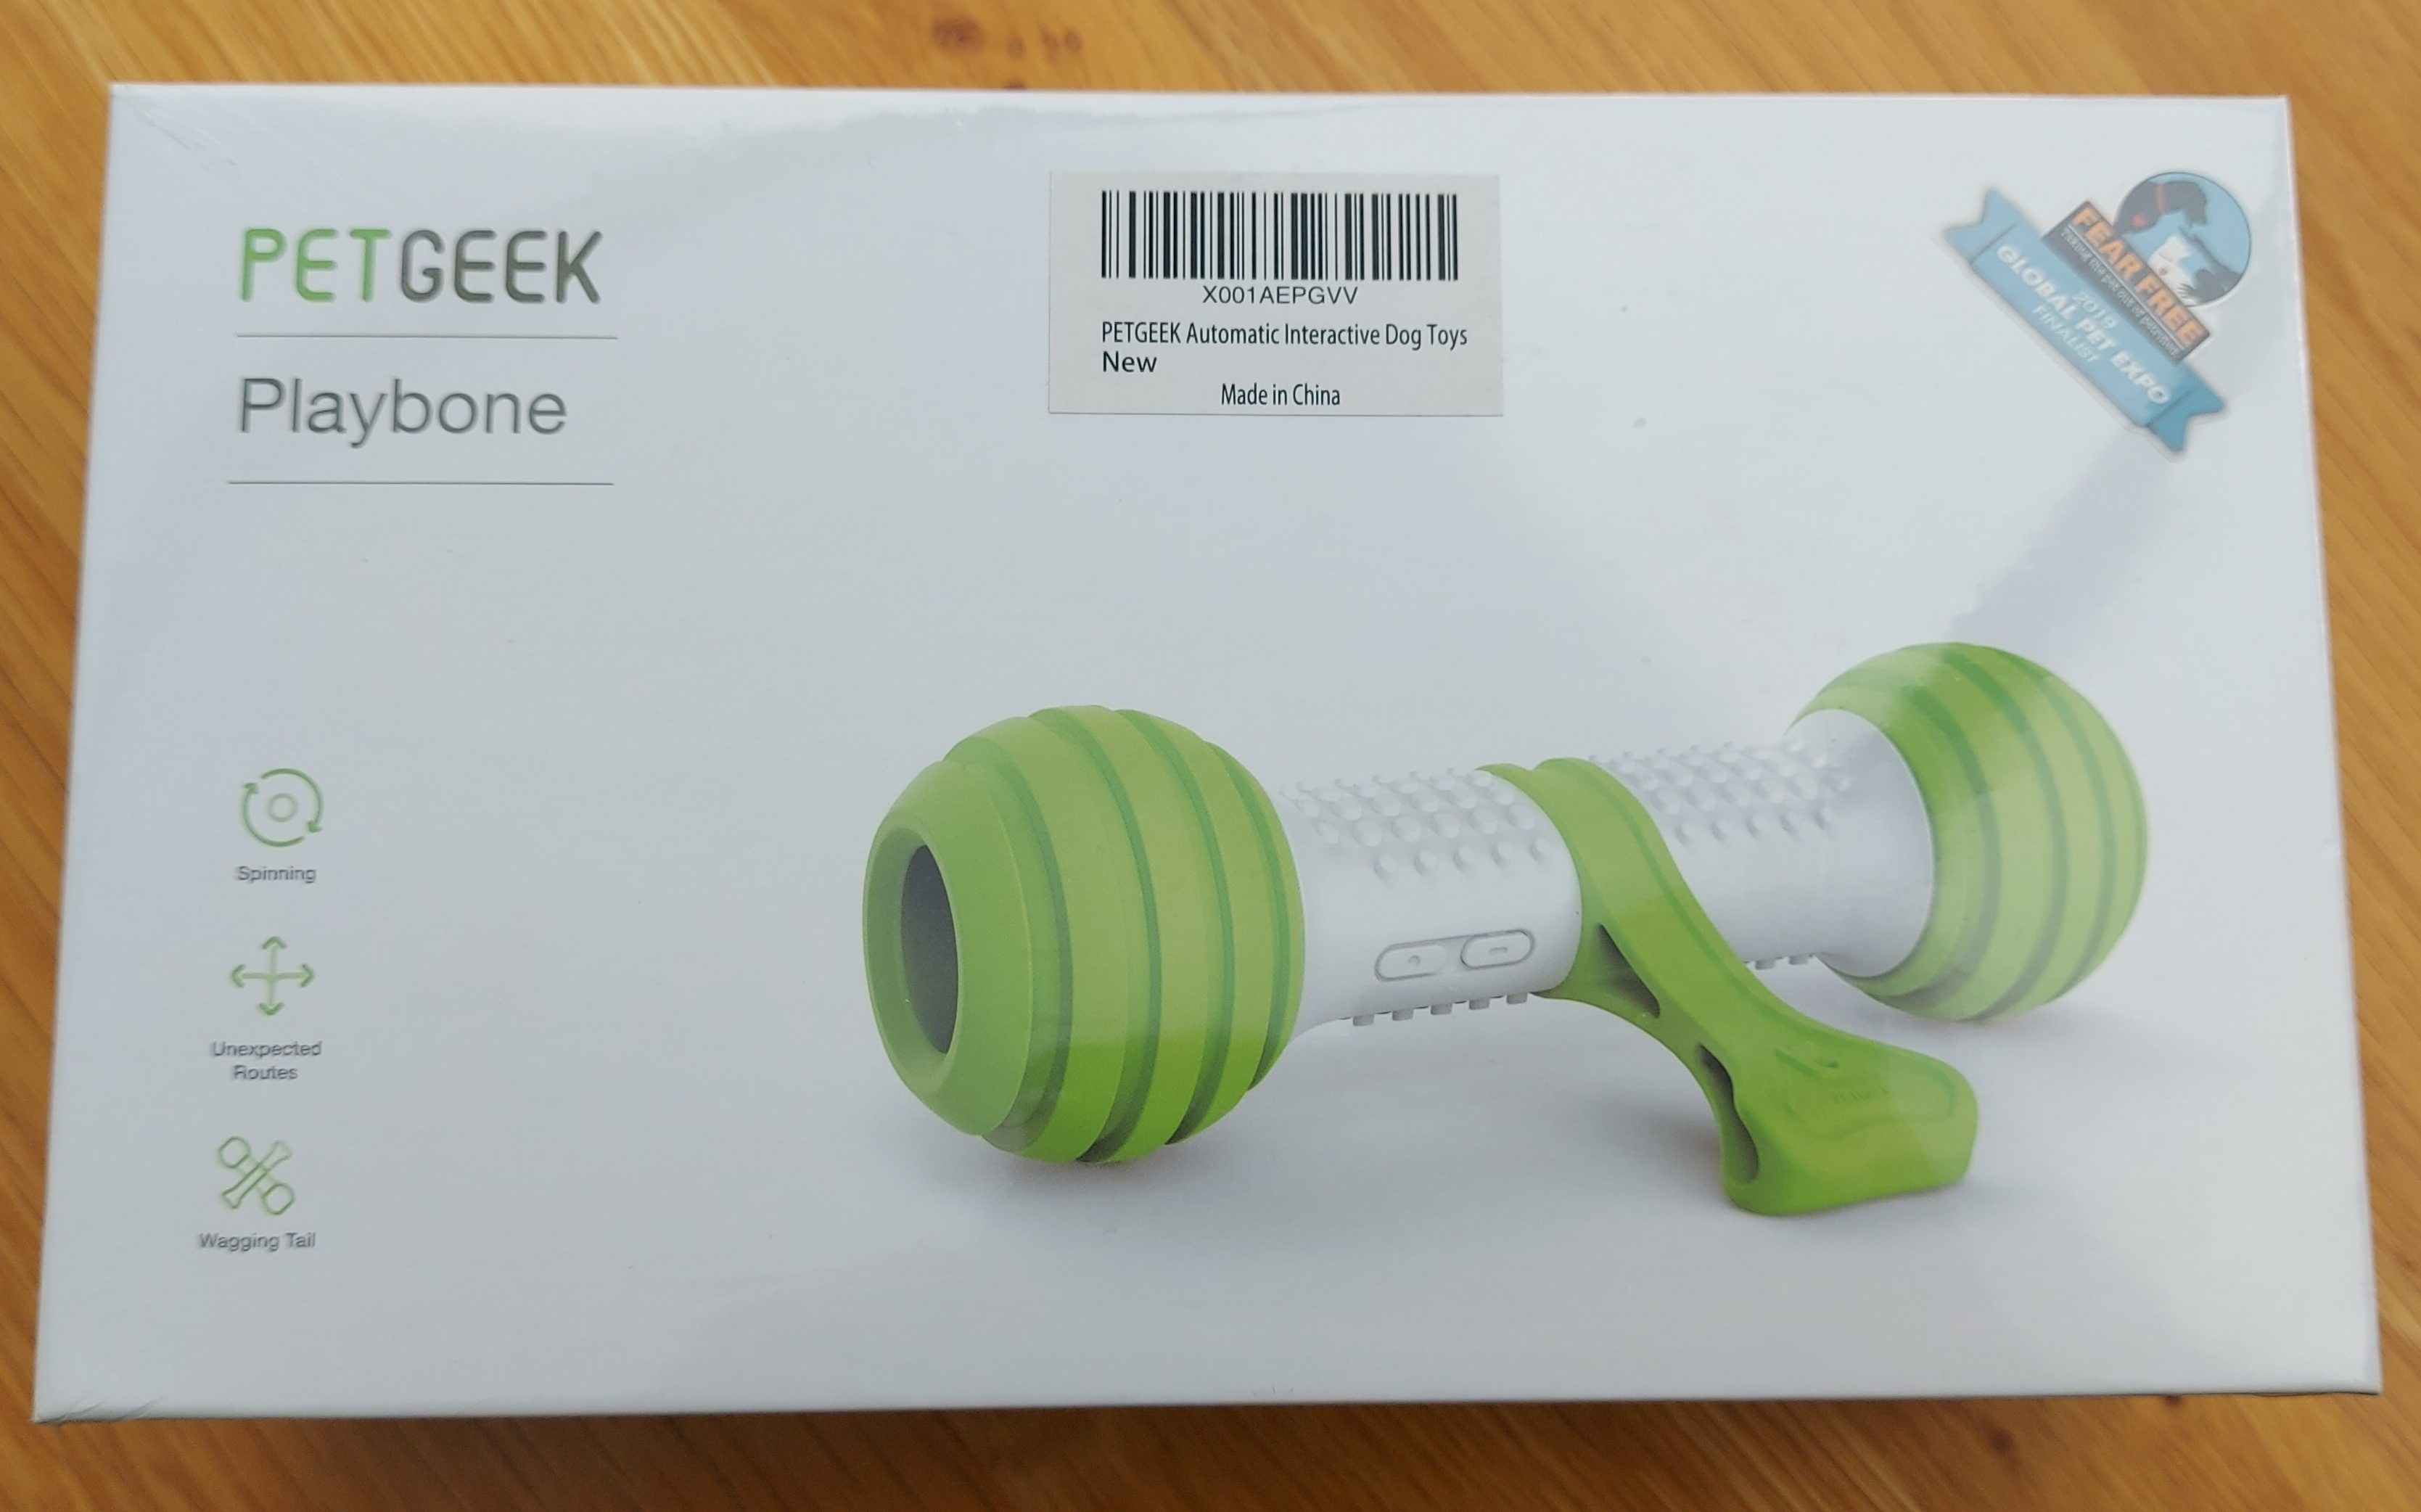 petgeek petbone dog toy